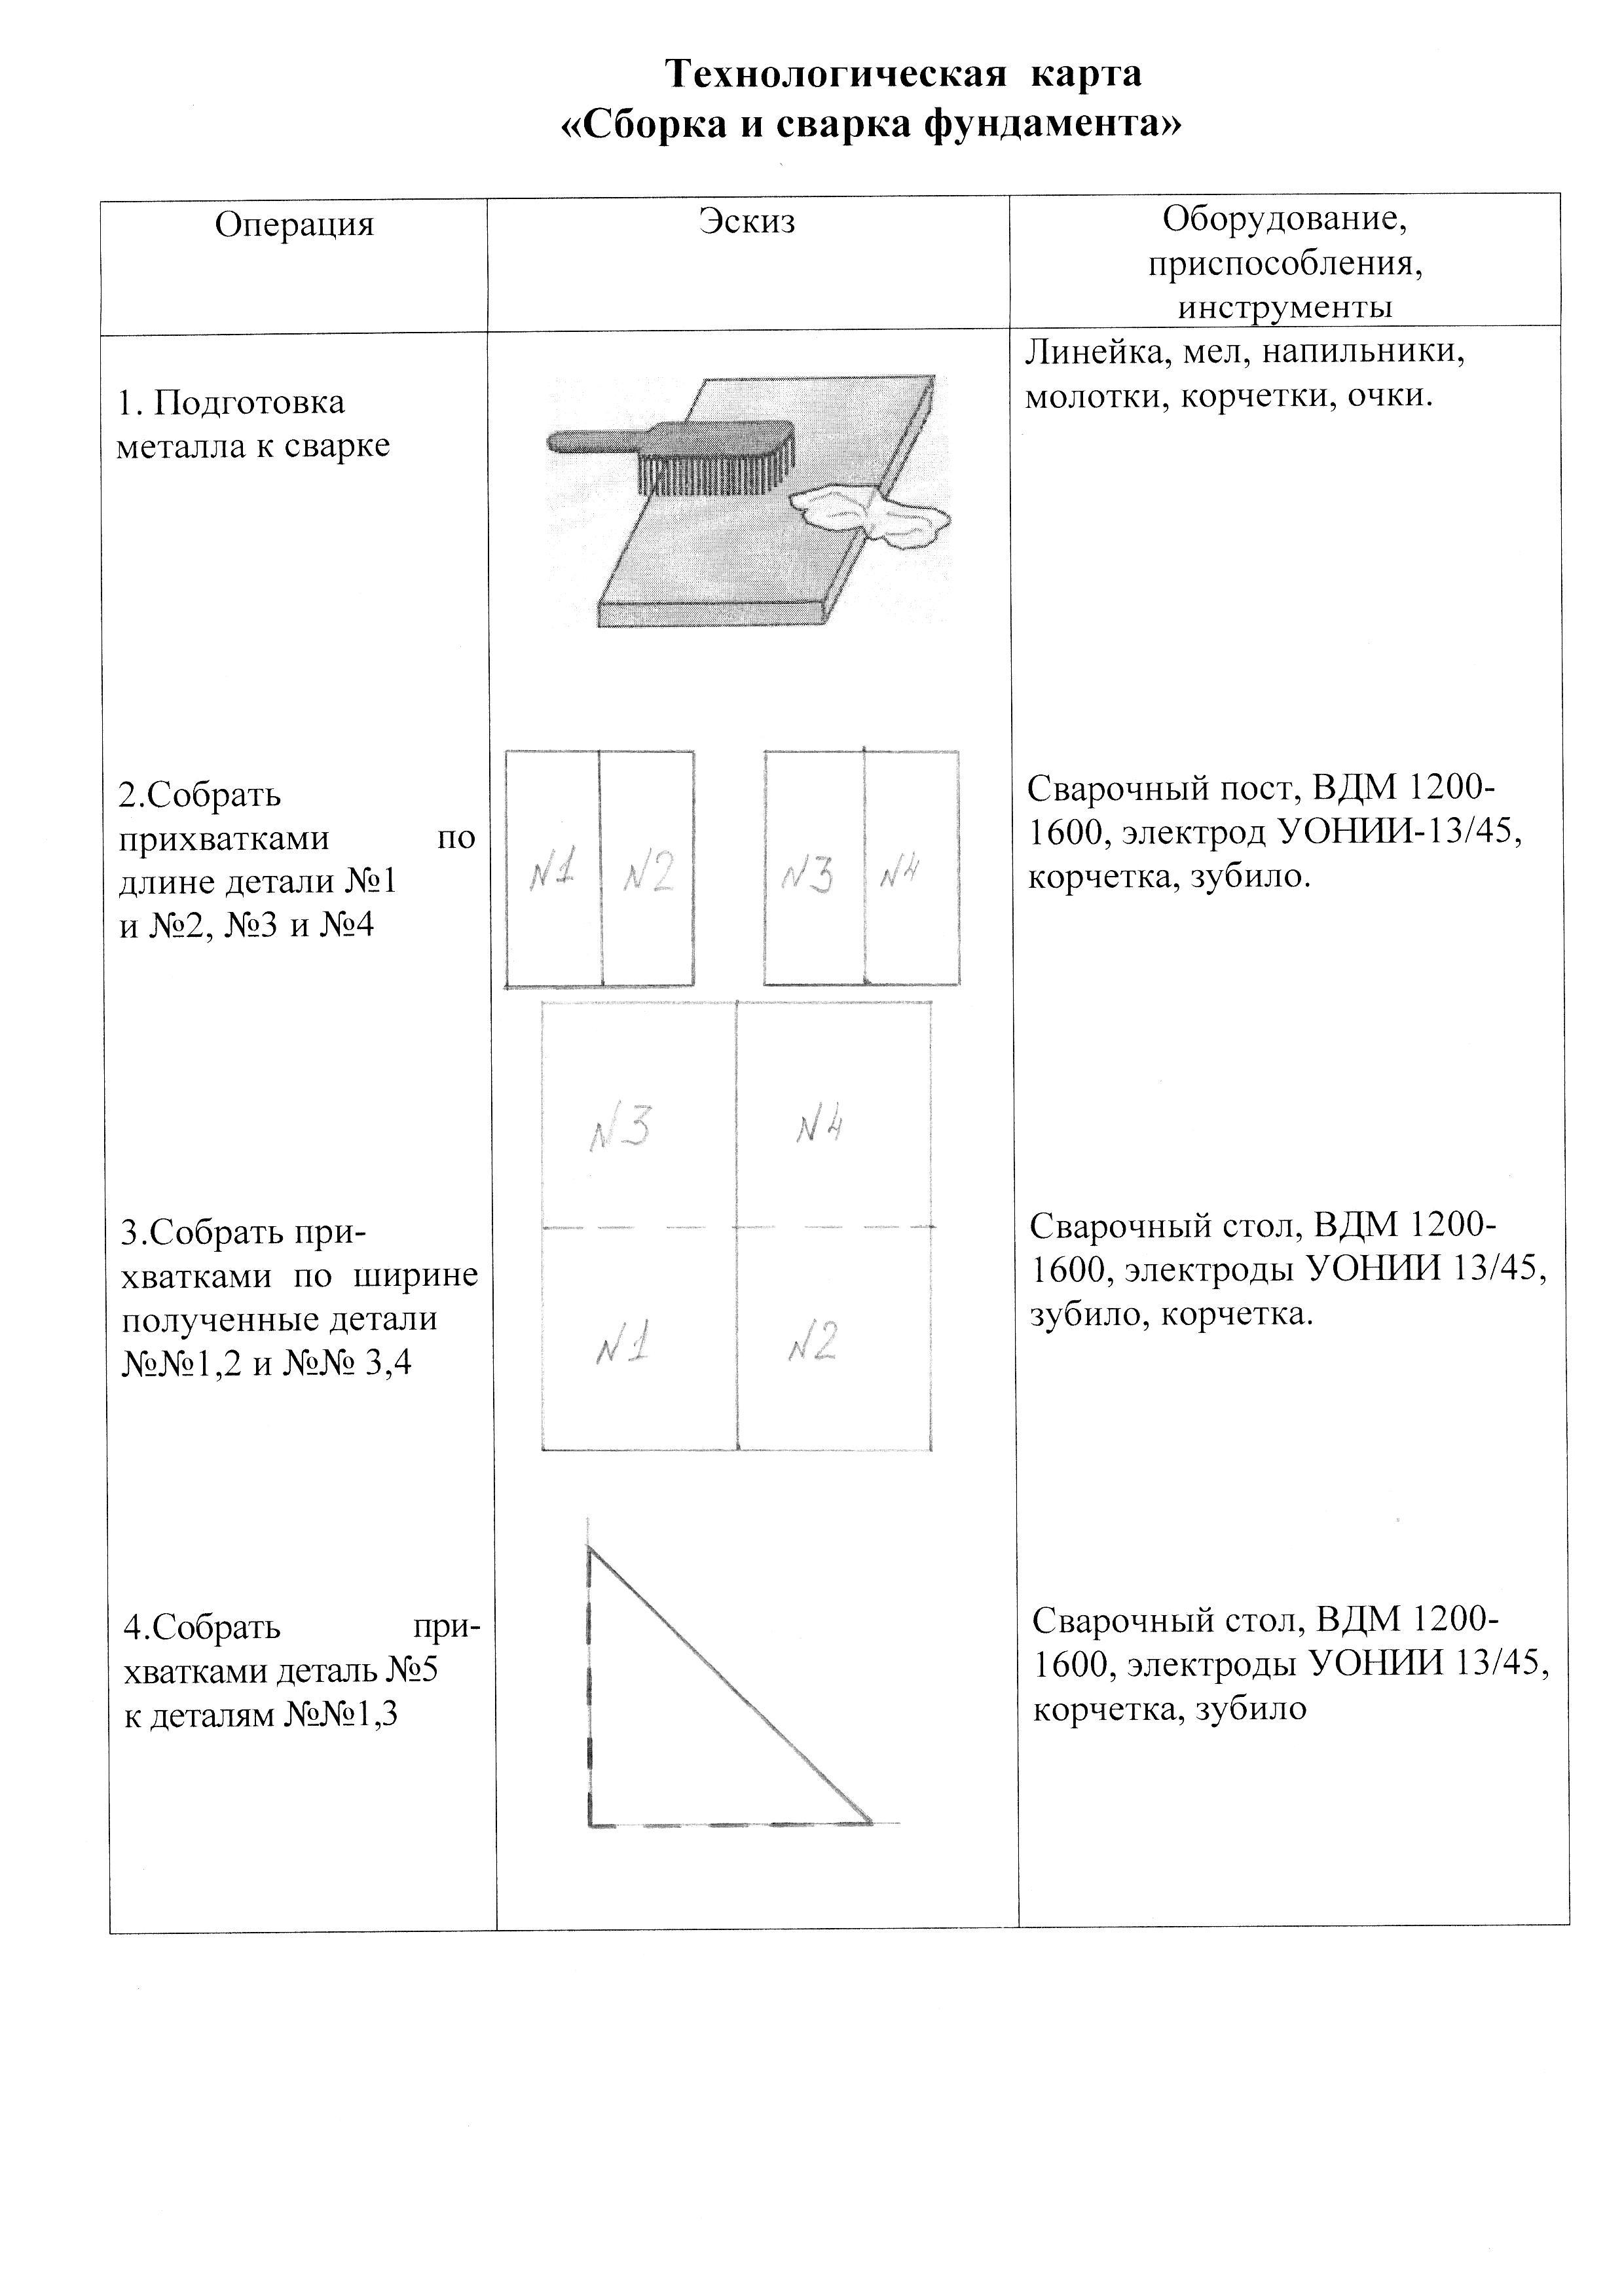 Техкарта на сварку металлоконструкций - о металле